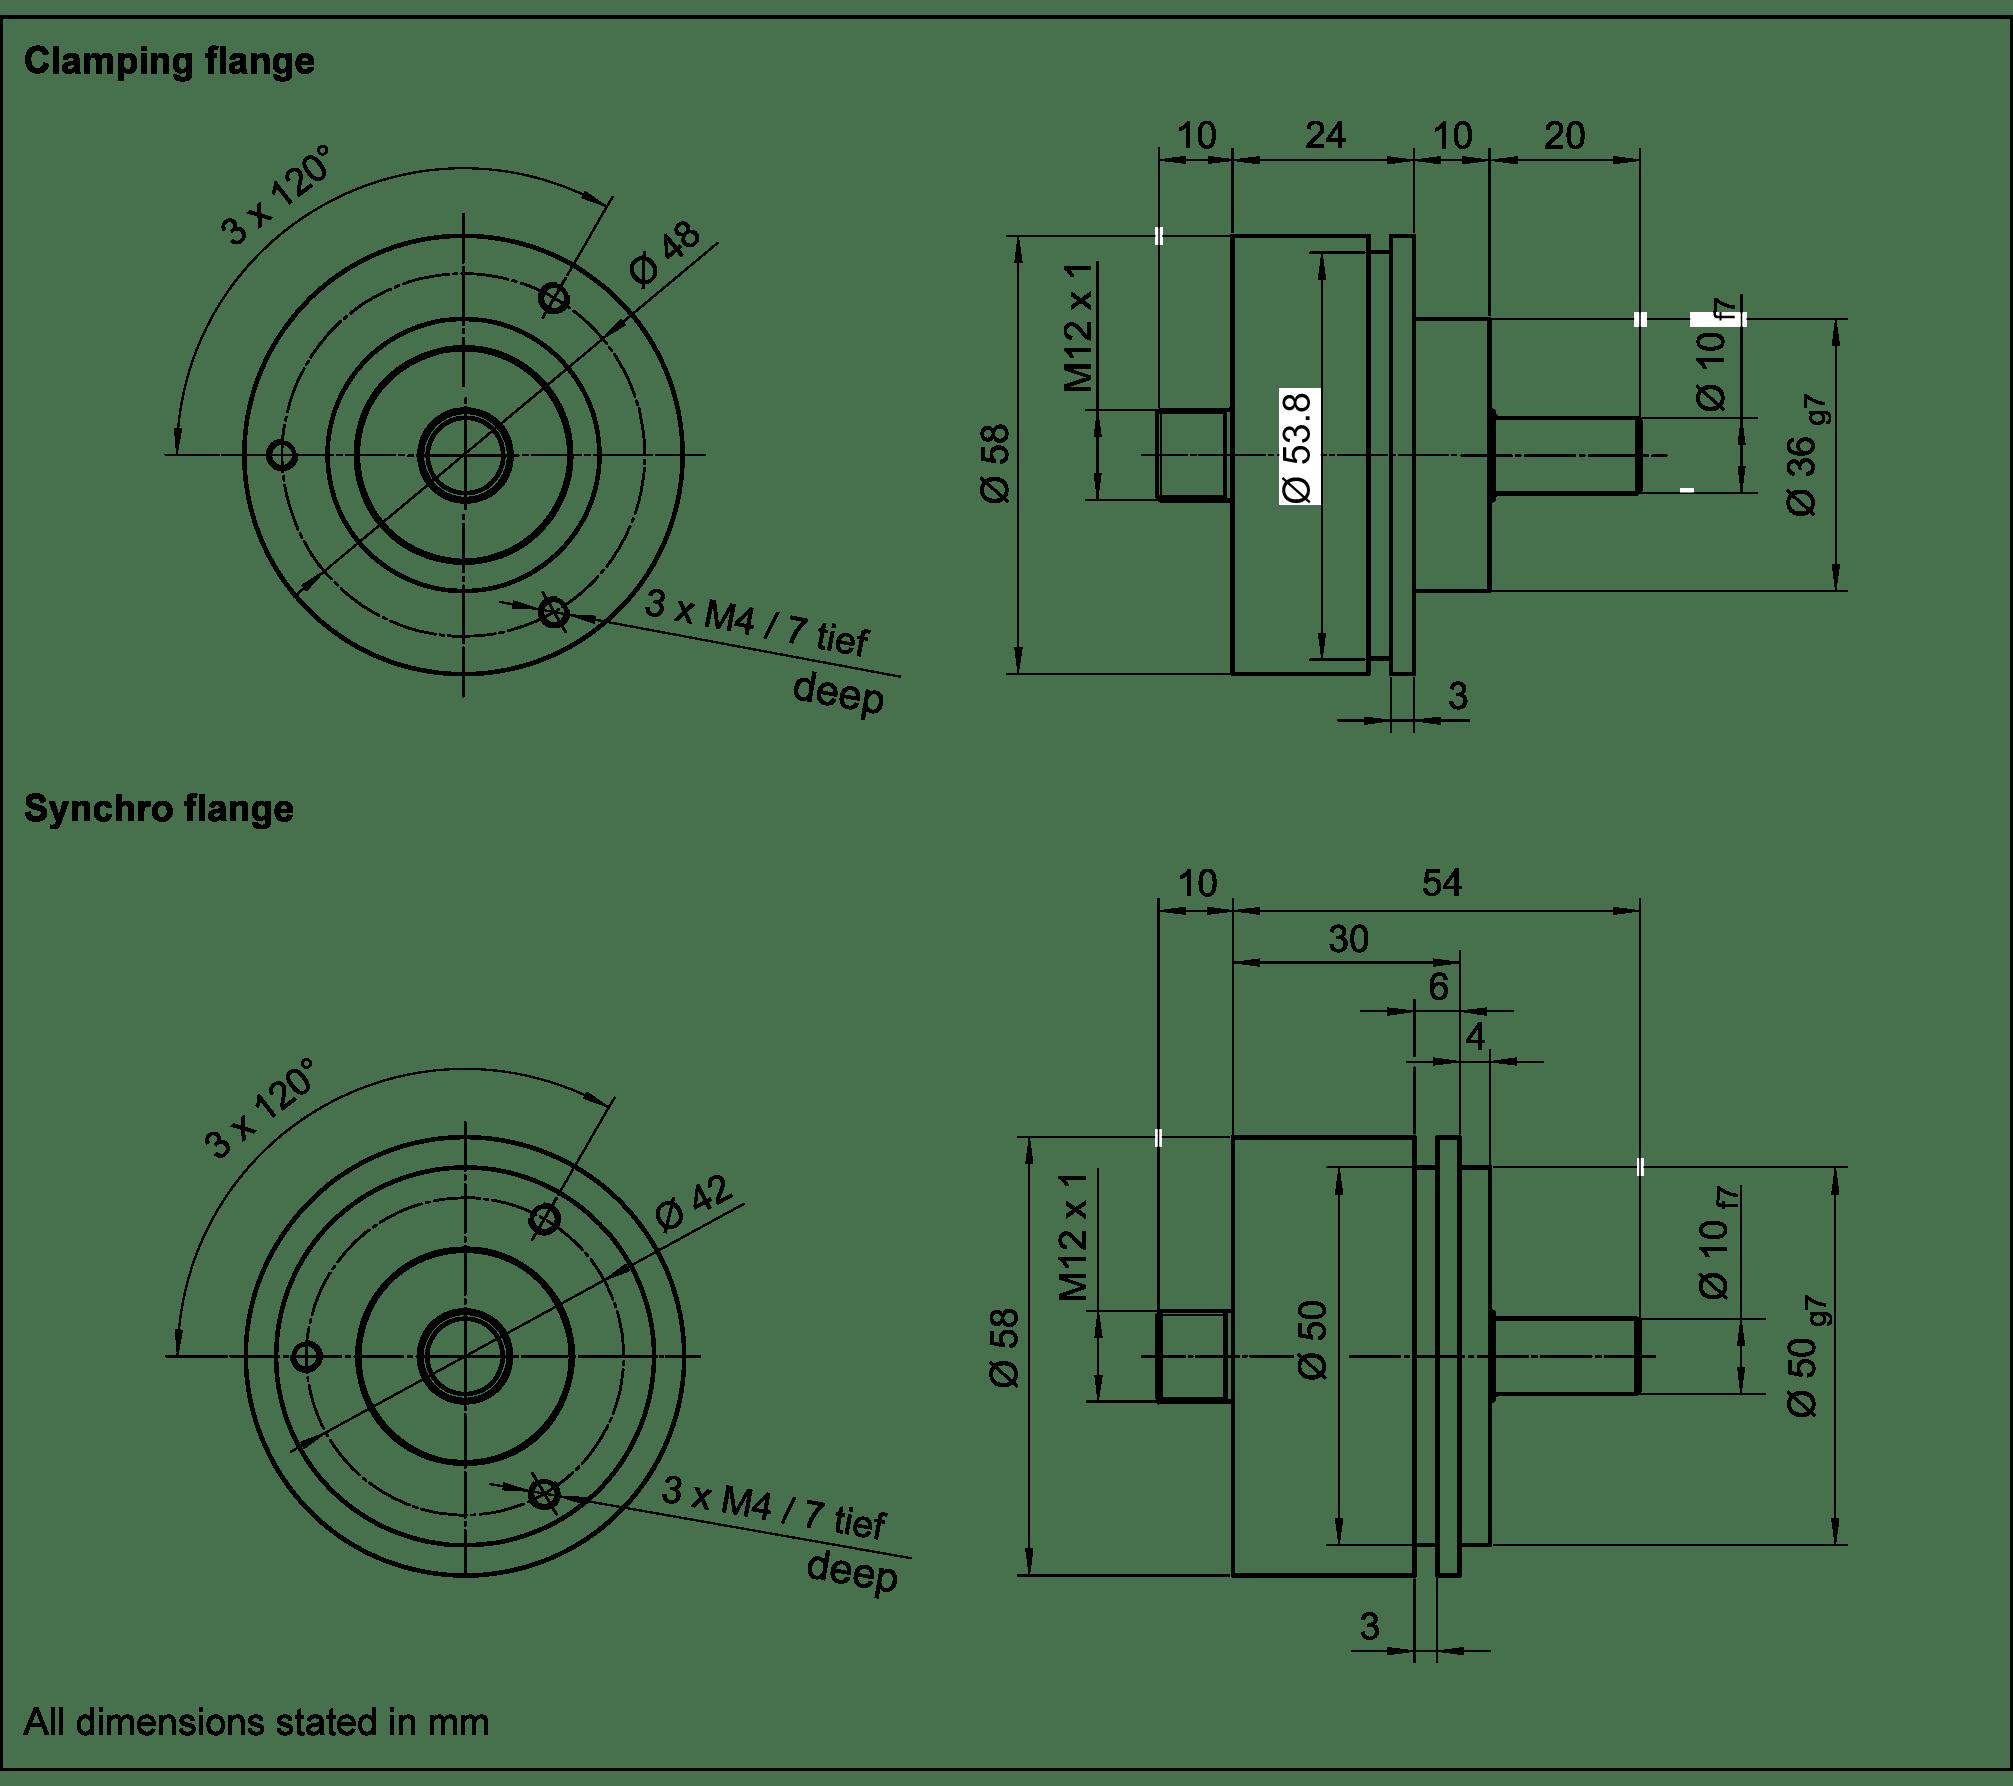 wiringpi rotary encoder